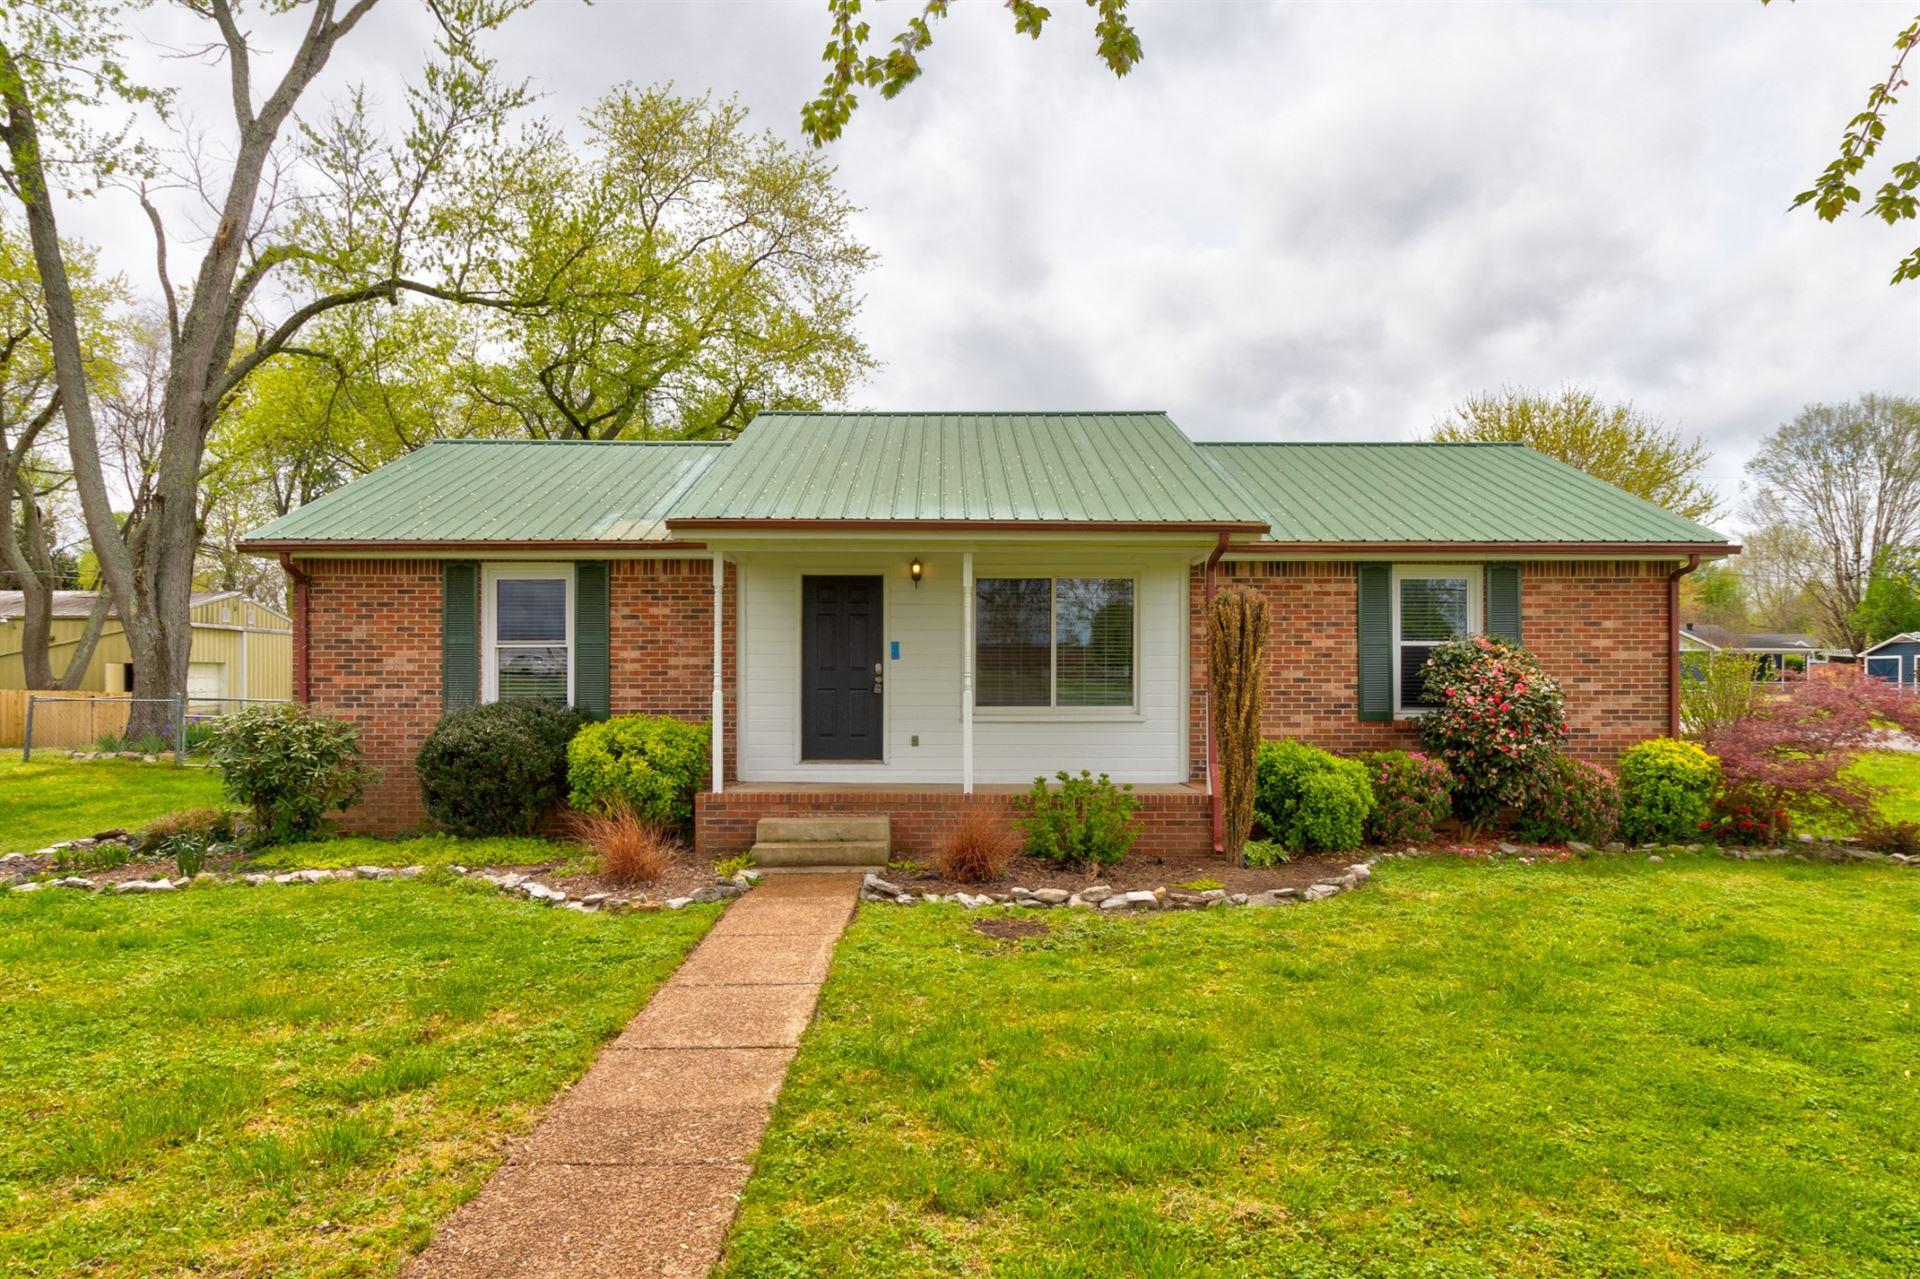 1000 Sam Davis Rd, Smyrna, TN 37167 - MLS#: 2243469